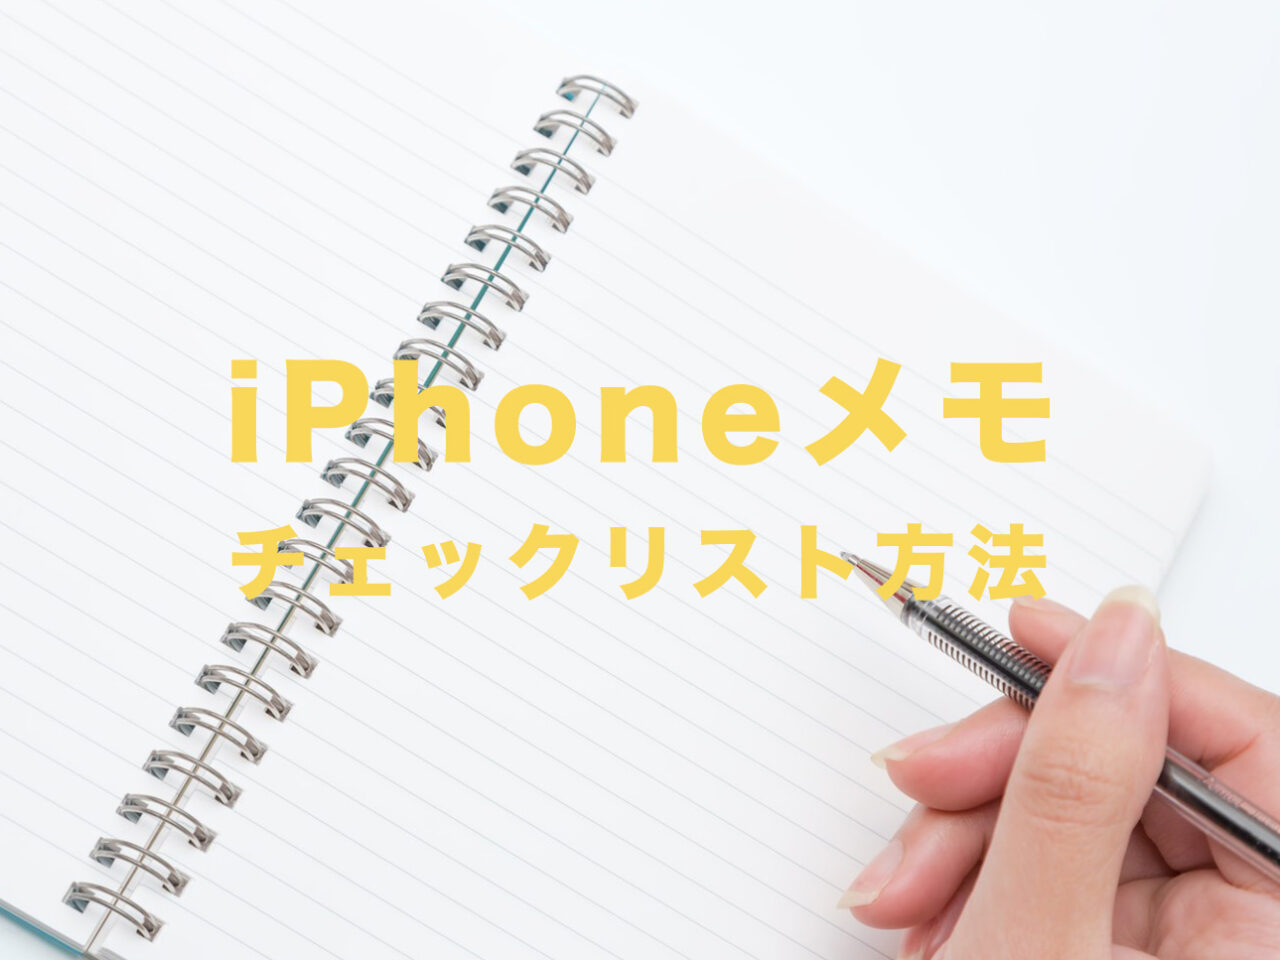 iPhoneのメモアプリでチェックリスト機能のやり方&作り方を解説。【iOS標準】のサムネイル画像